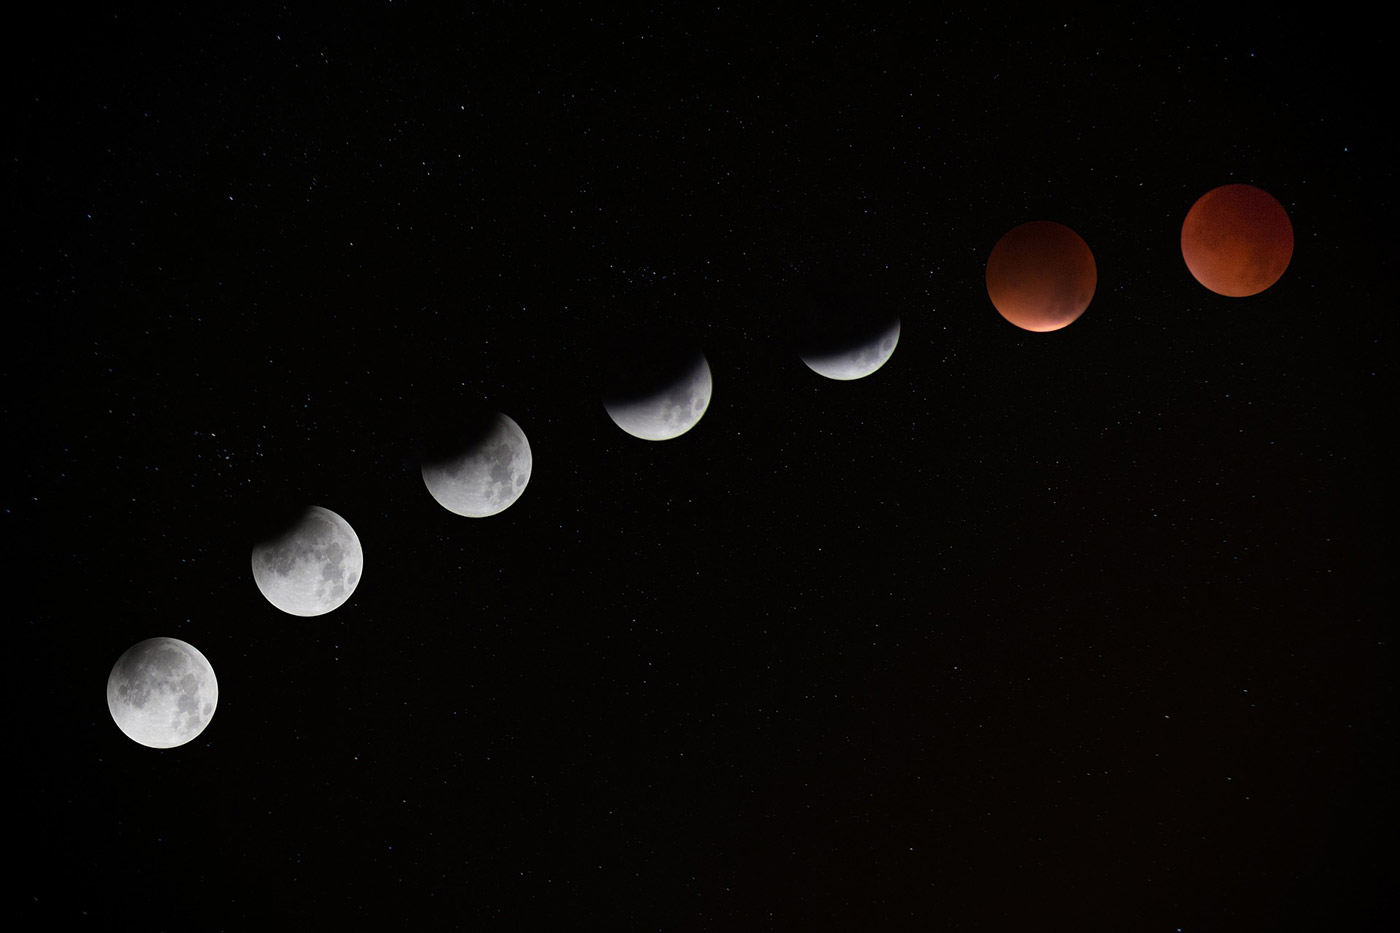 Lunar eclipse cycle